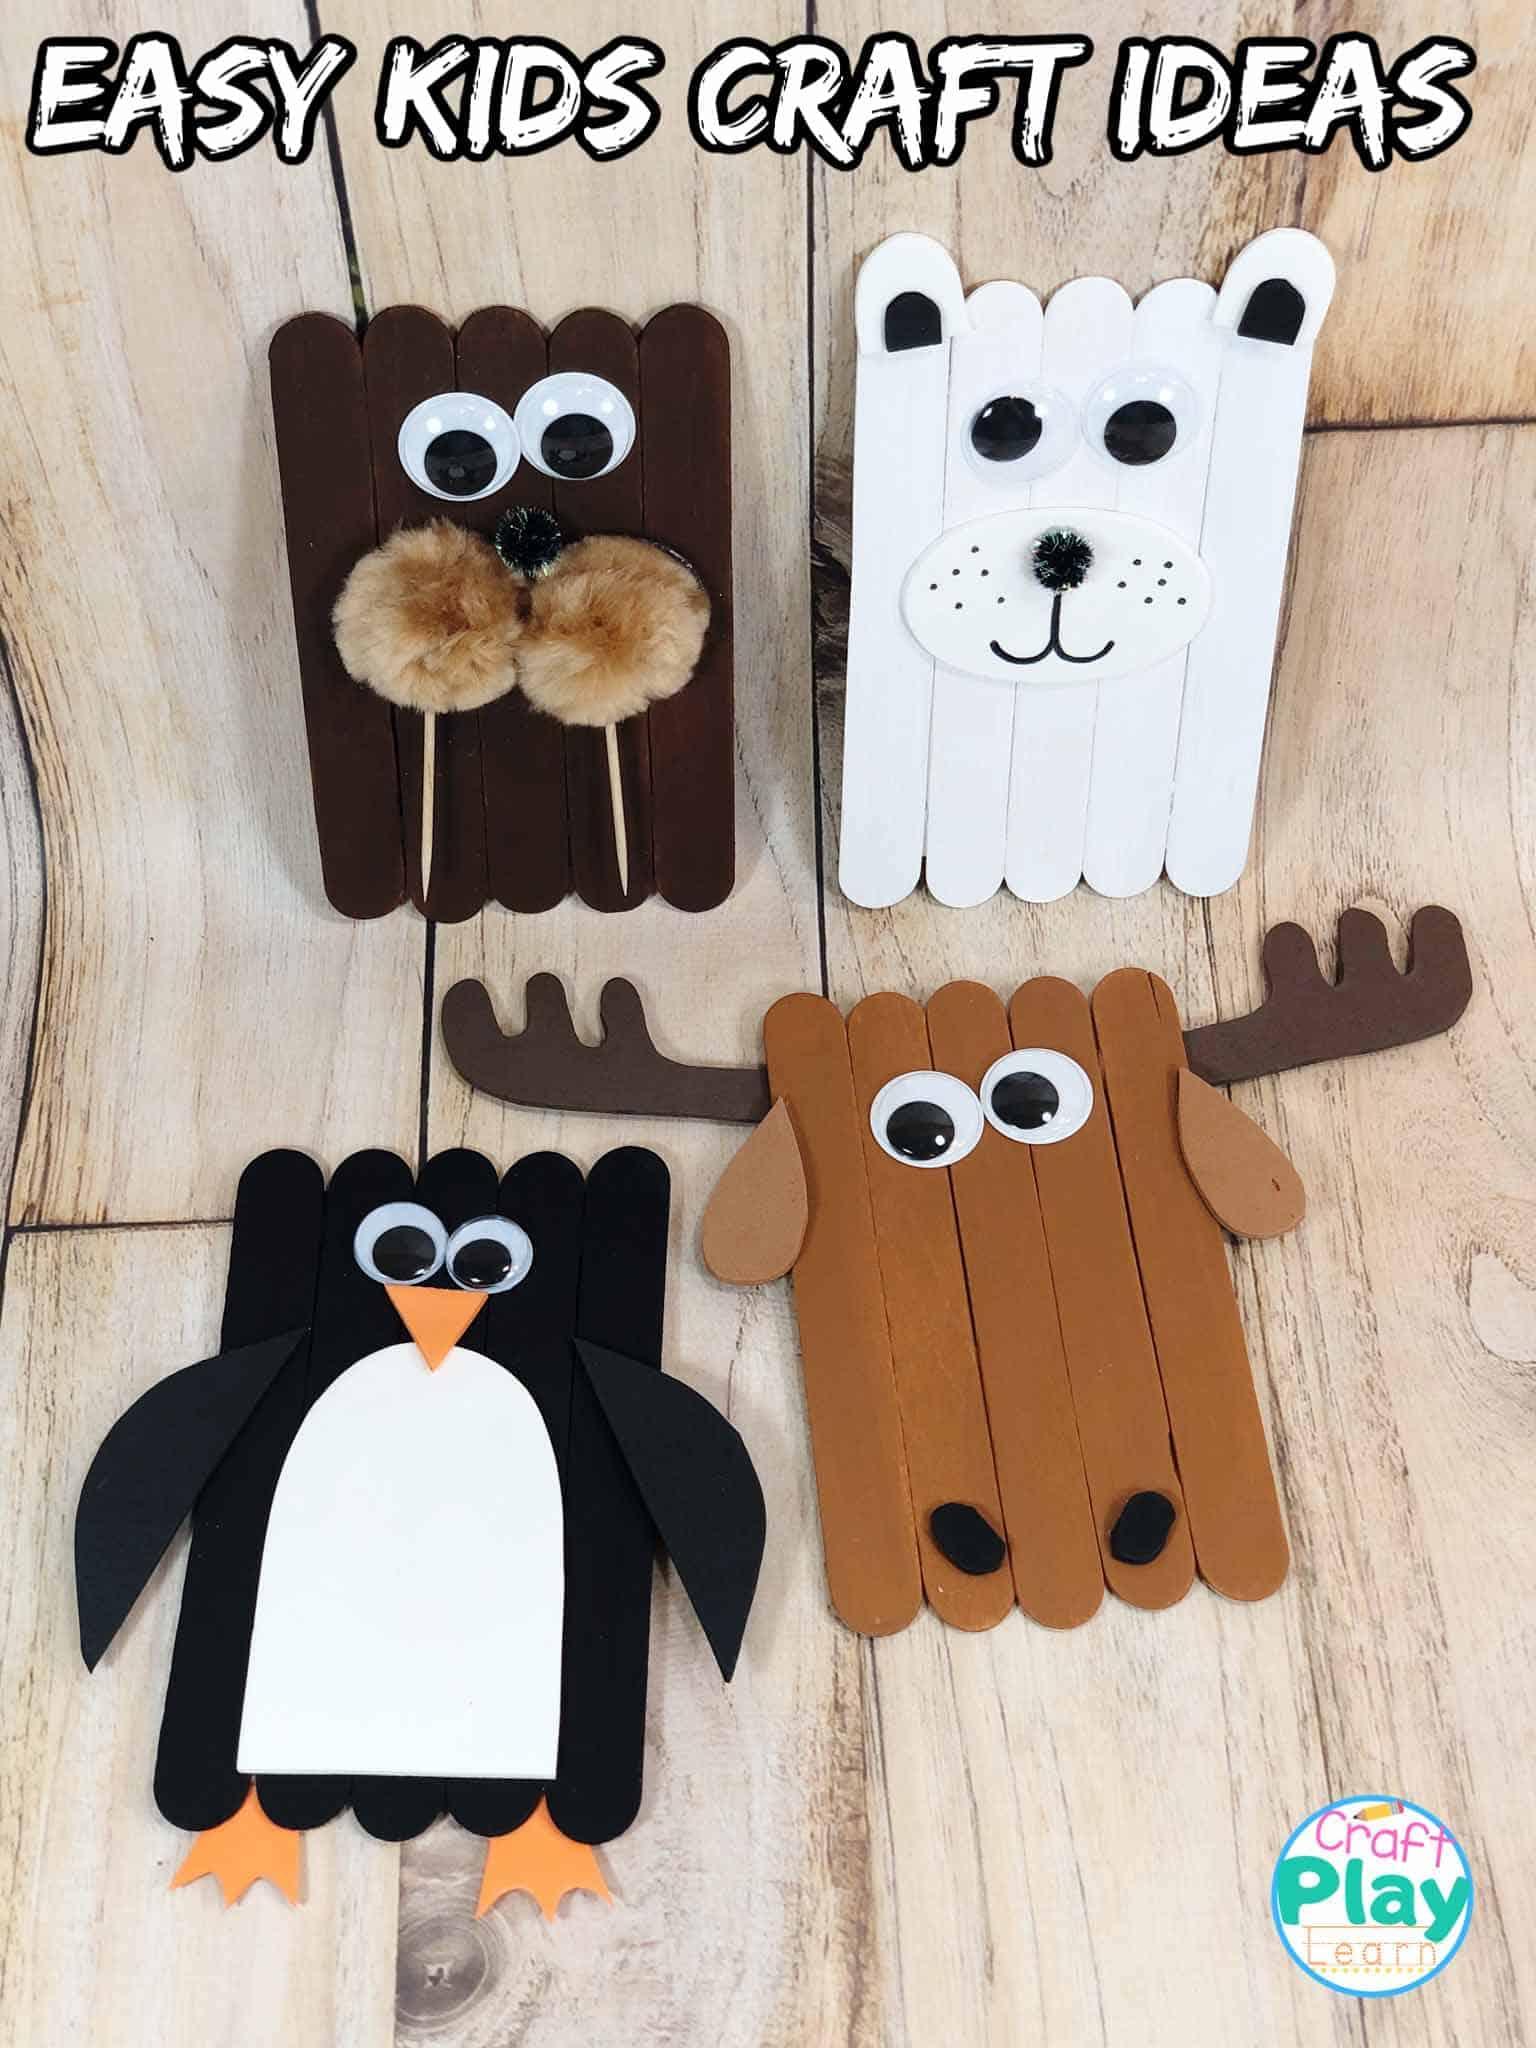 Moose Craft Preschool : moose, craft, preschool, Arctic, Animals, Penguin,, Polar, Bear,, Walrus, Moose, Craft, Learn